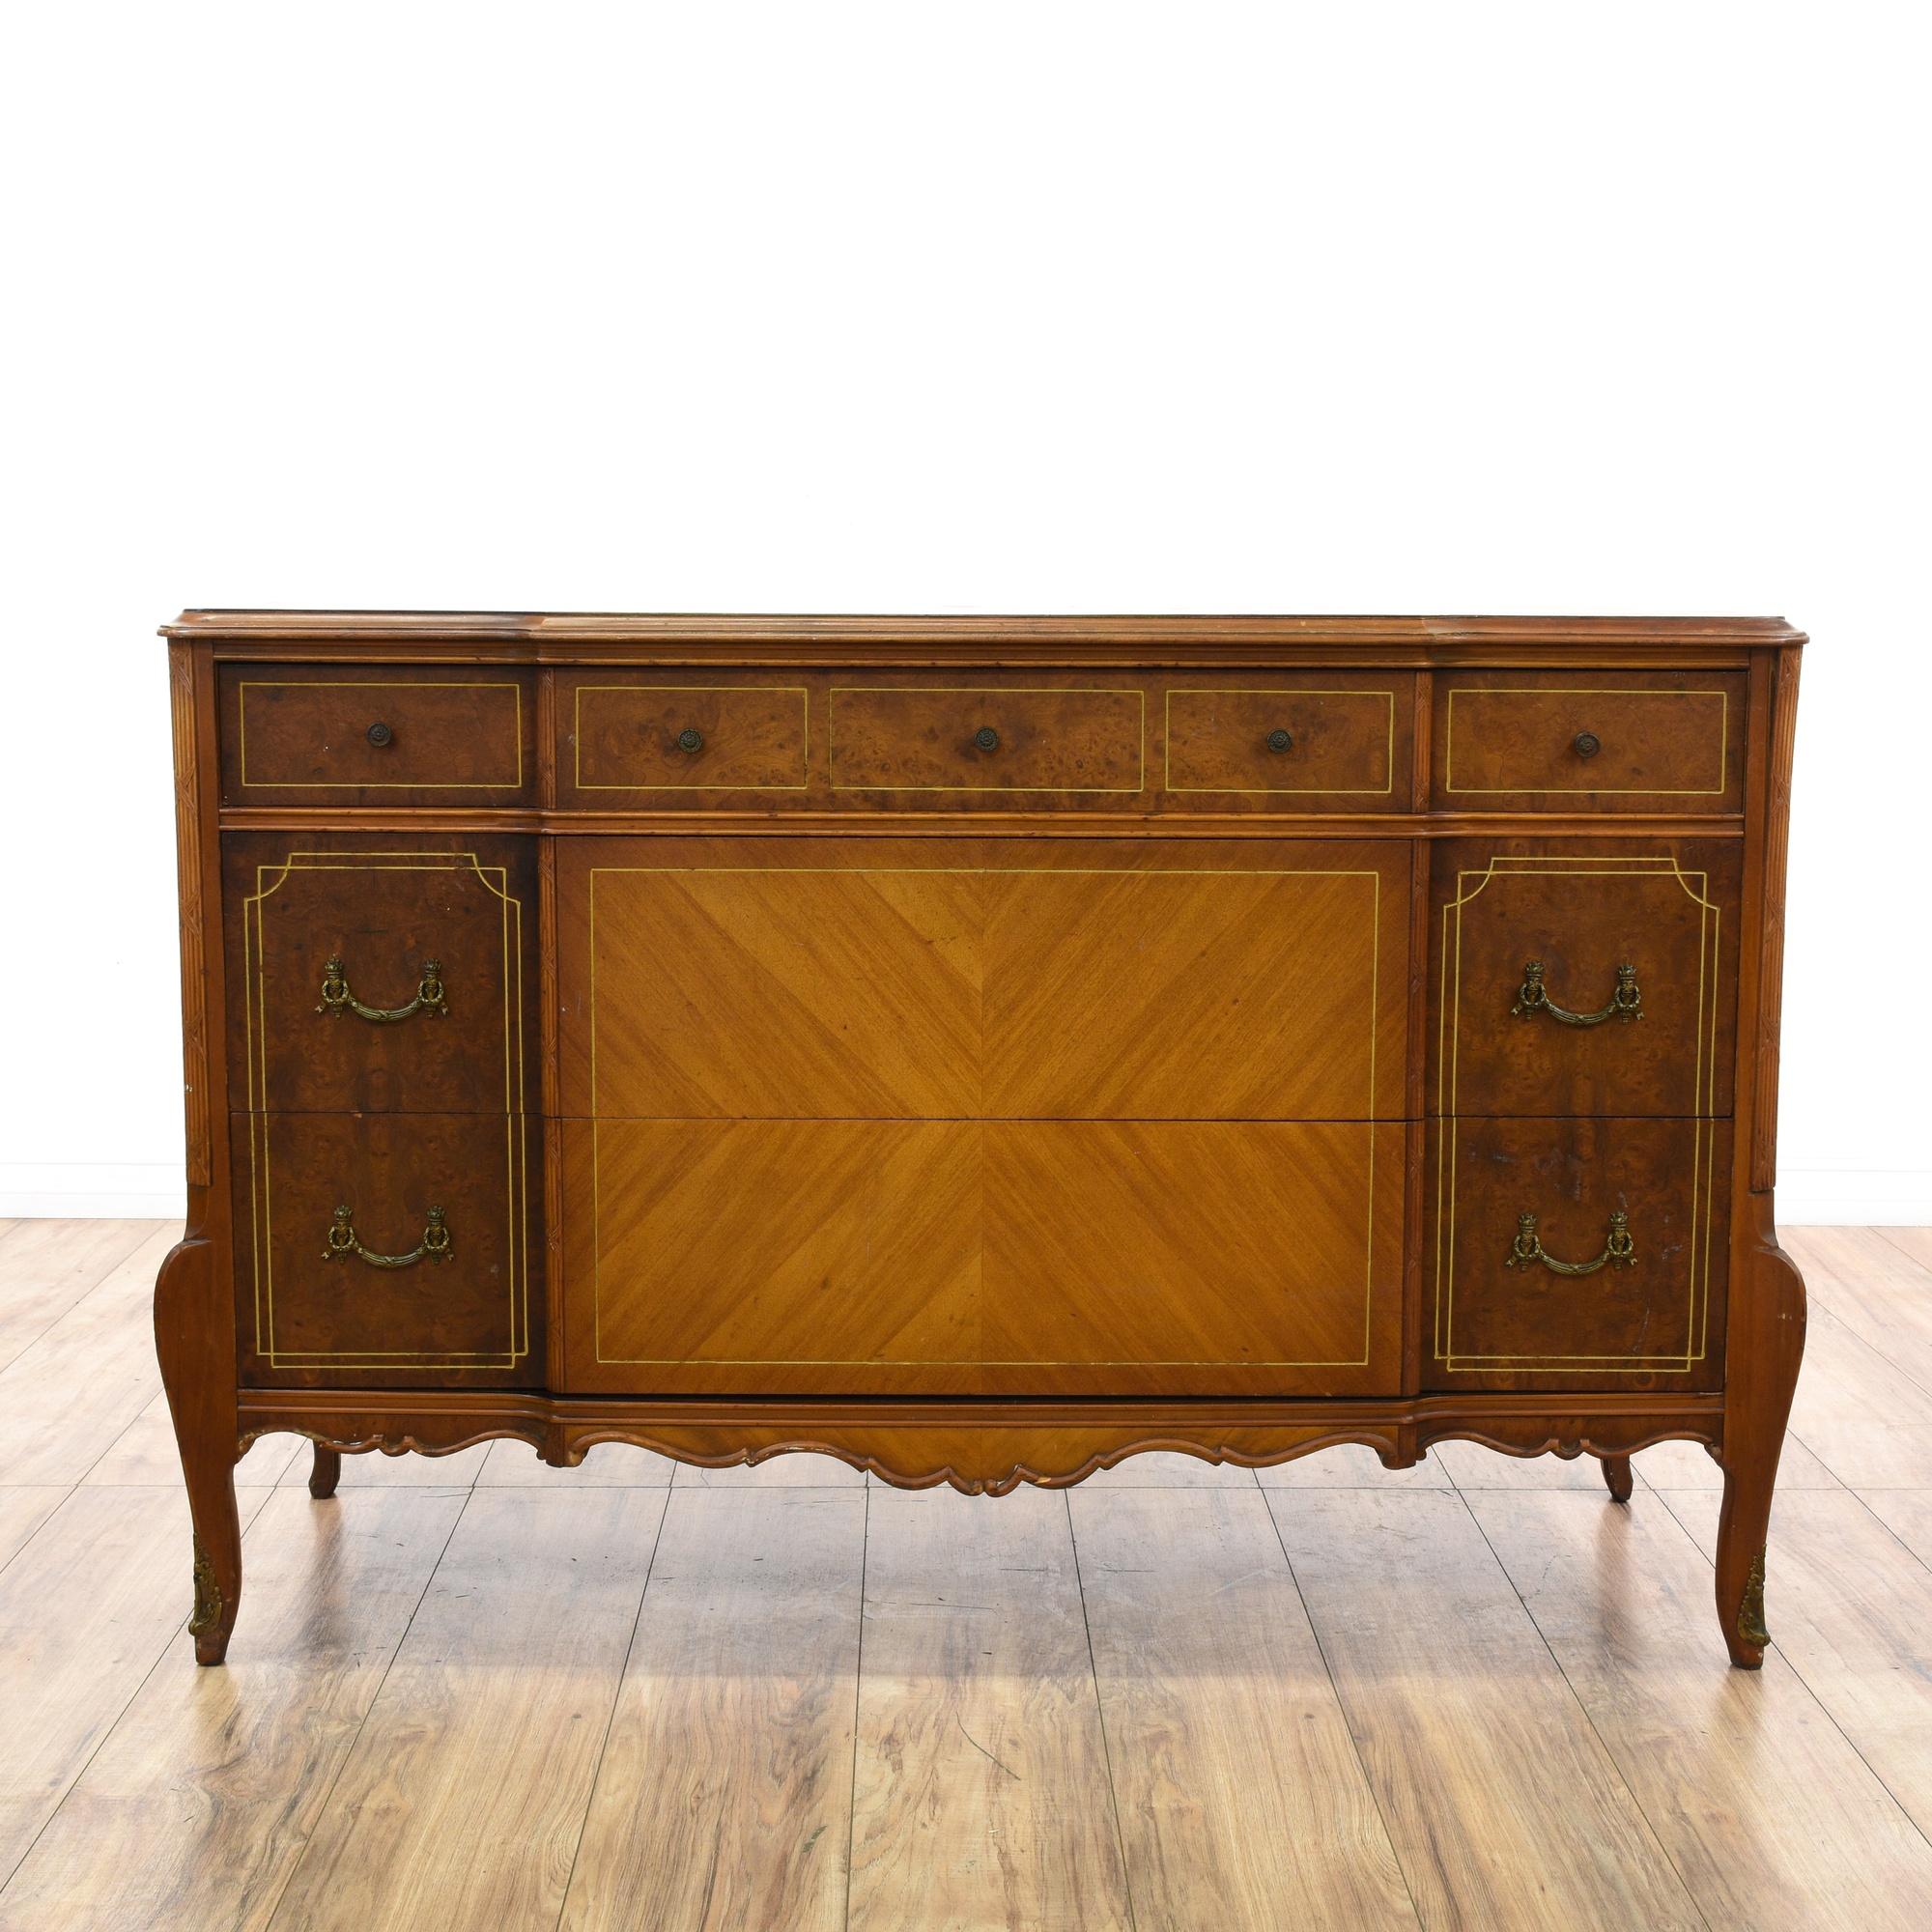 Captivating Antique Burl Wood Marquetry Dresser | Loveseat Vintage Furniture San Diego